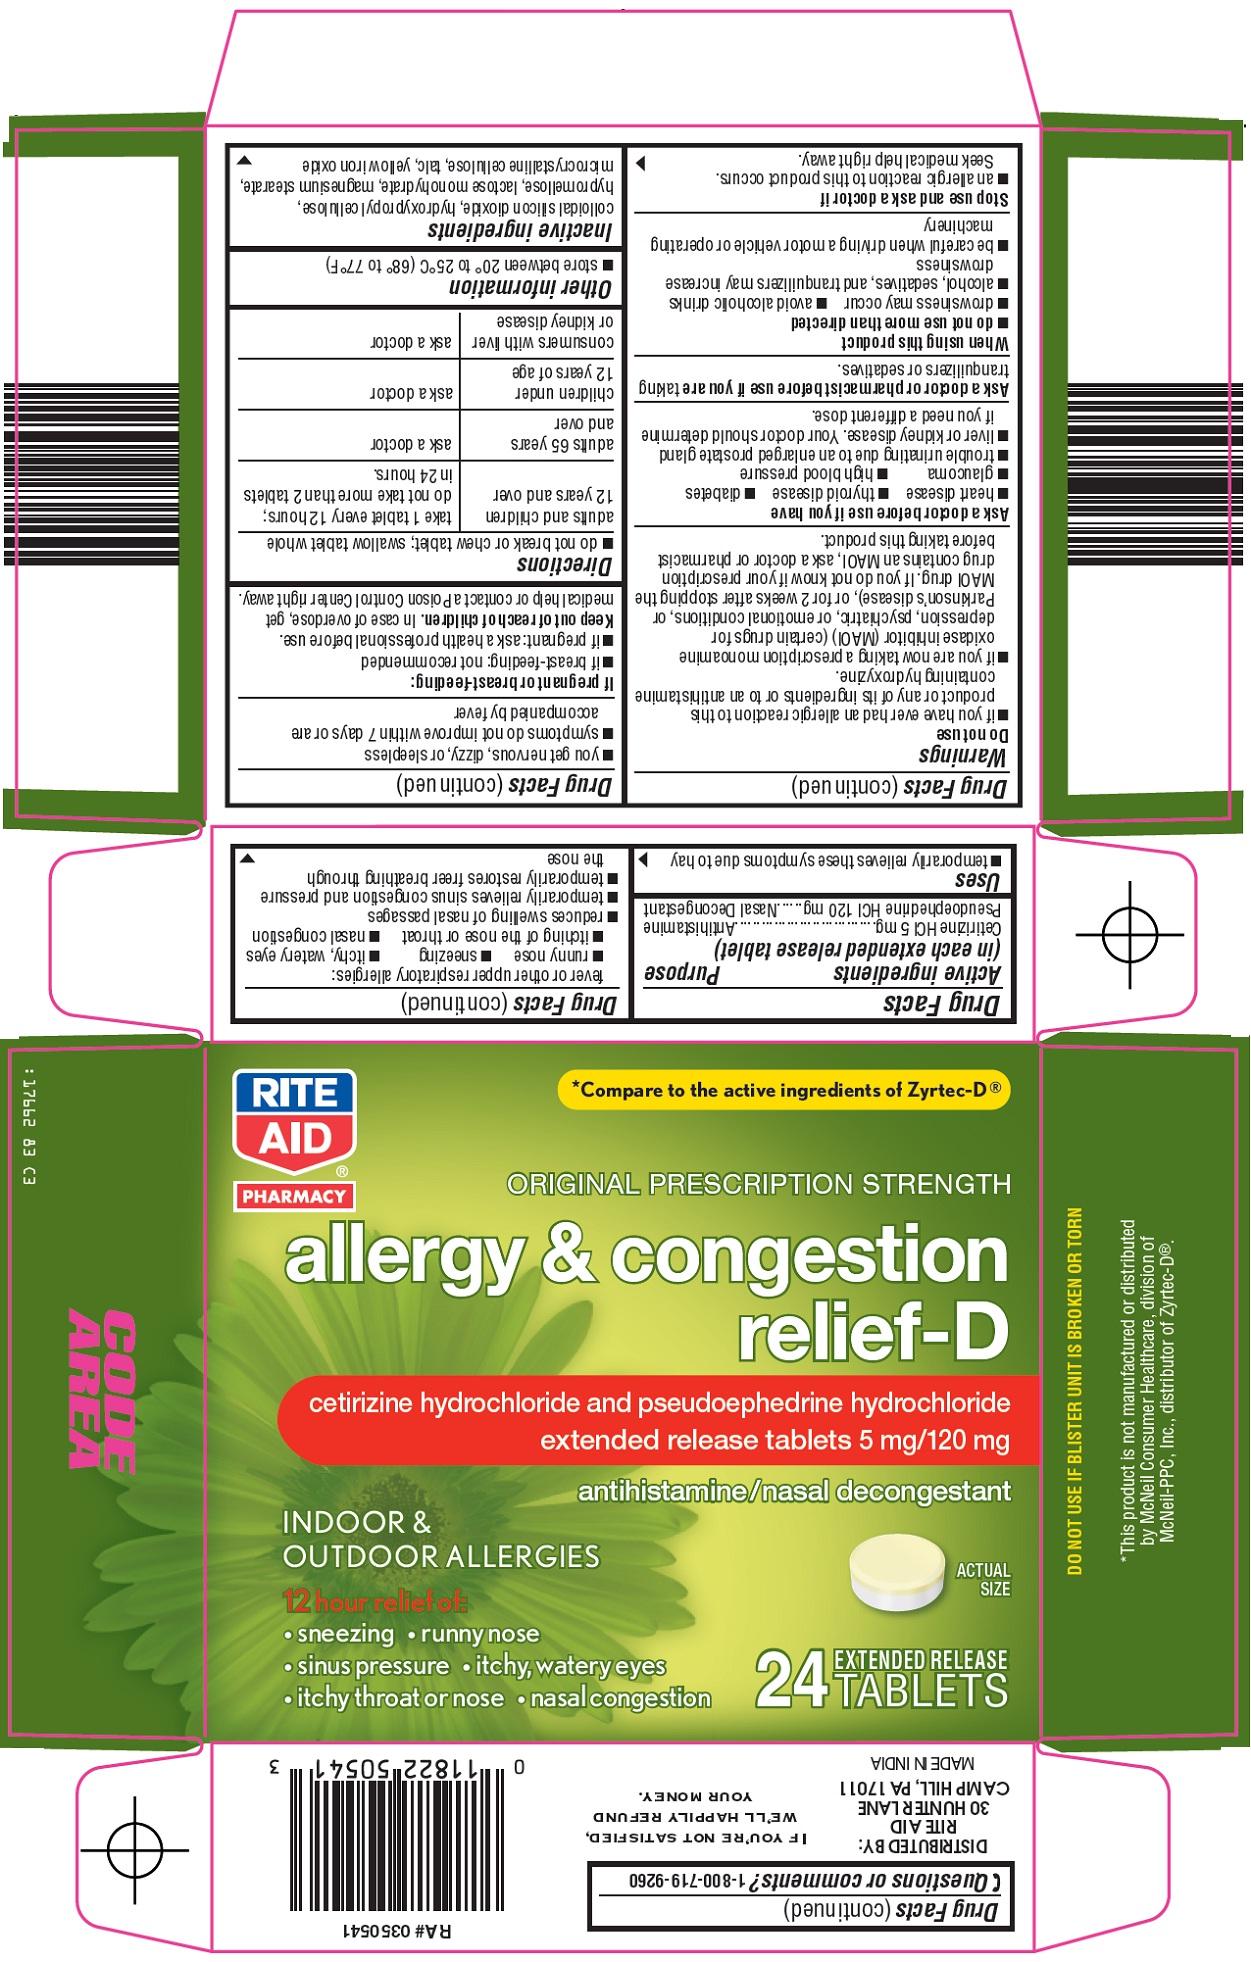 Allergy & Congestion Relief-D Carton Image